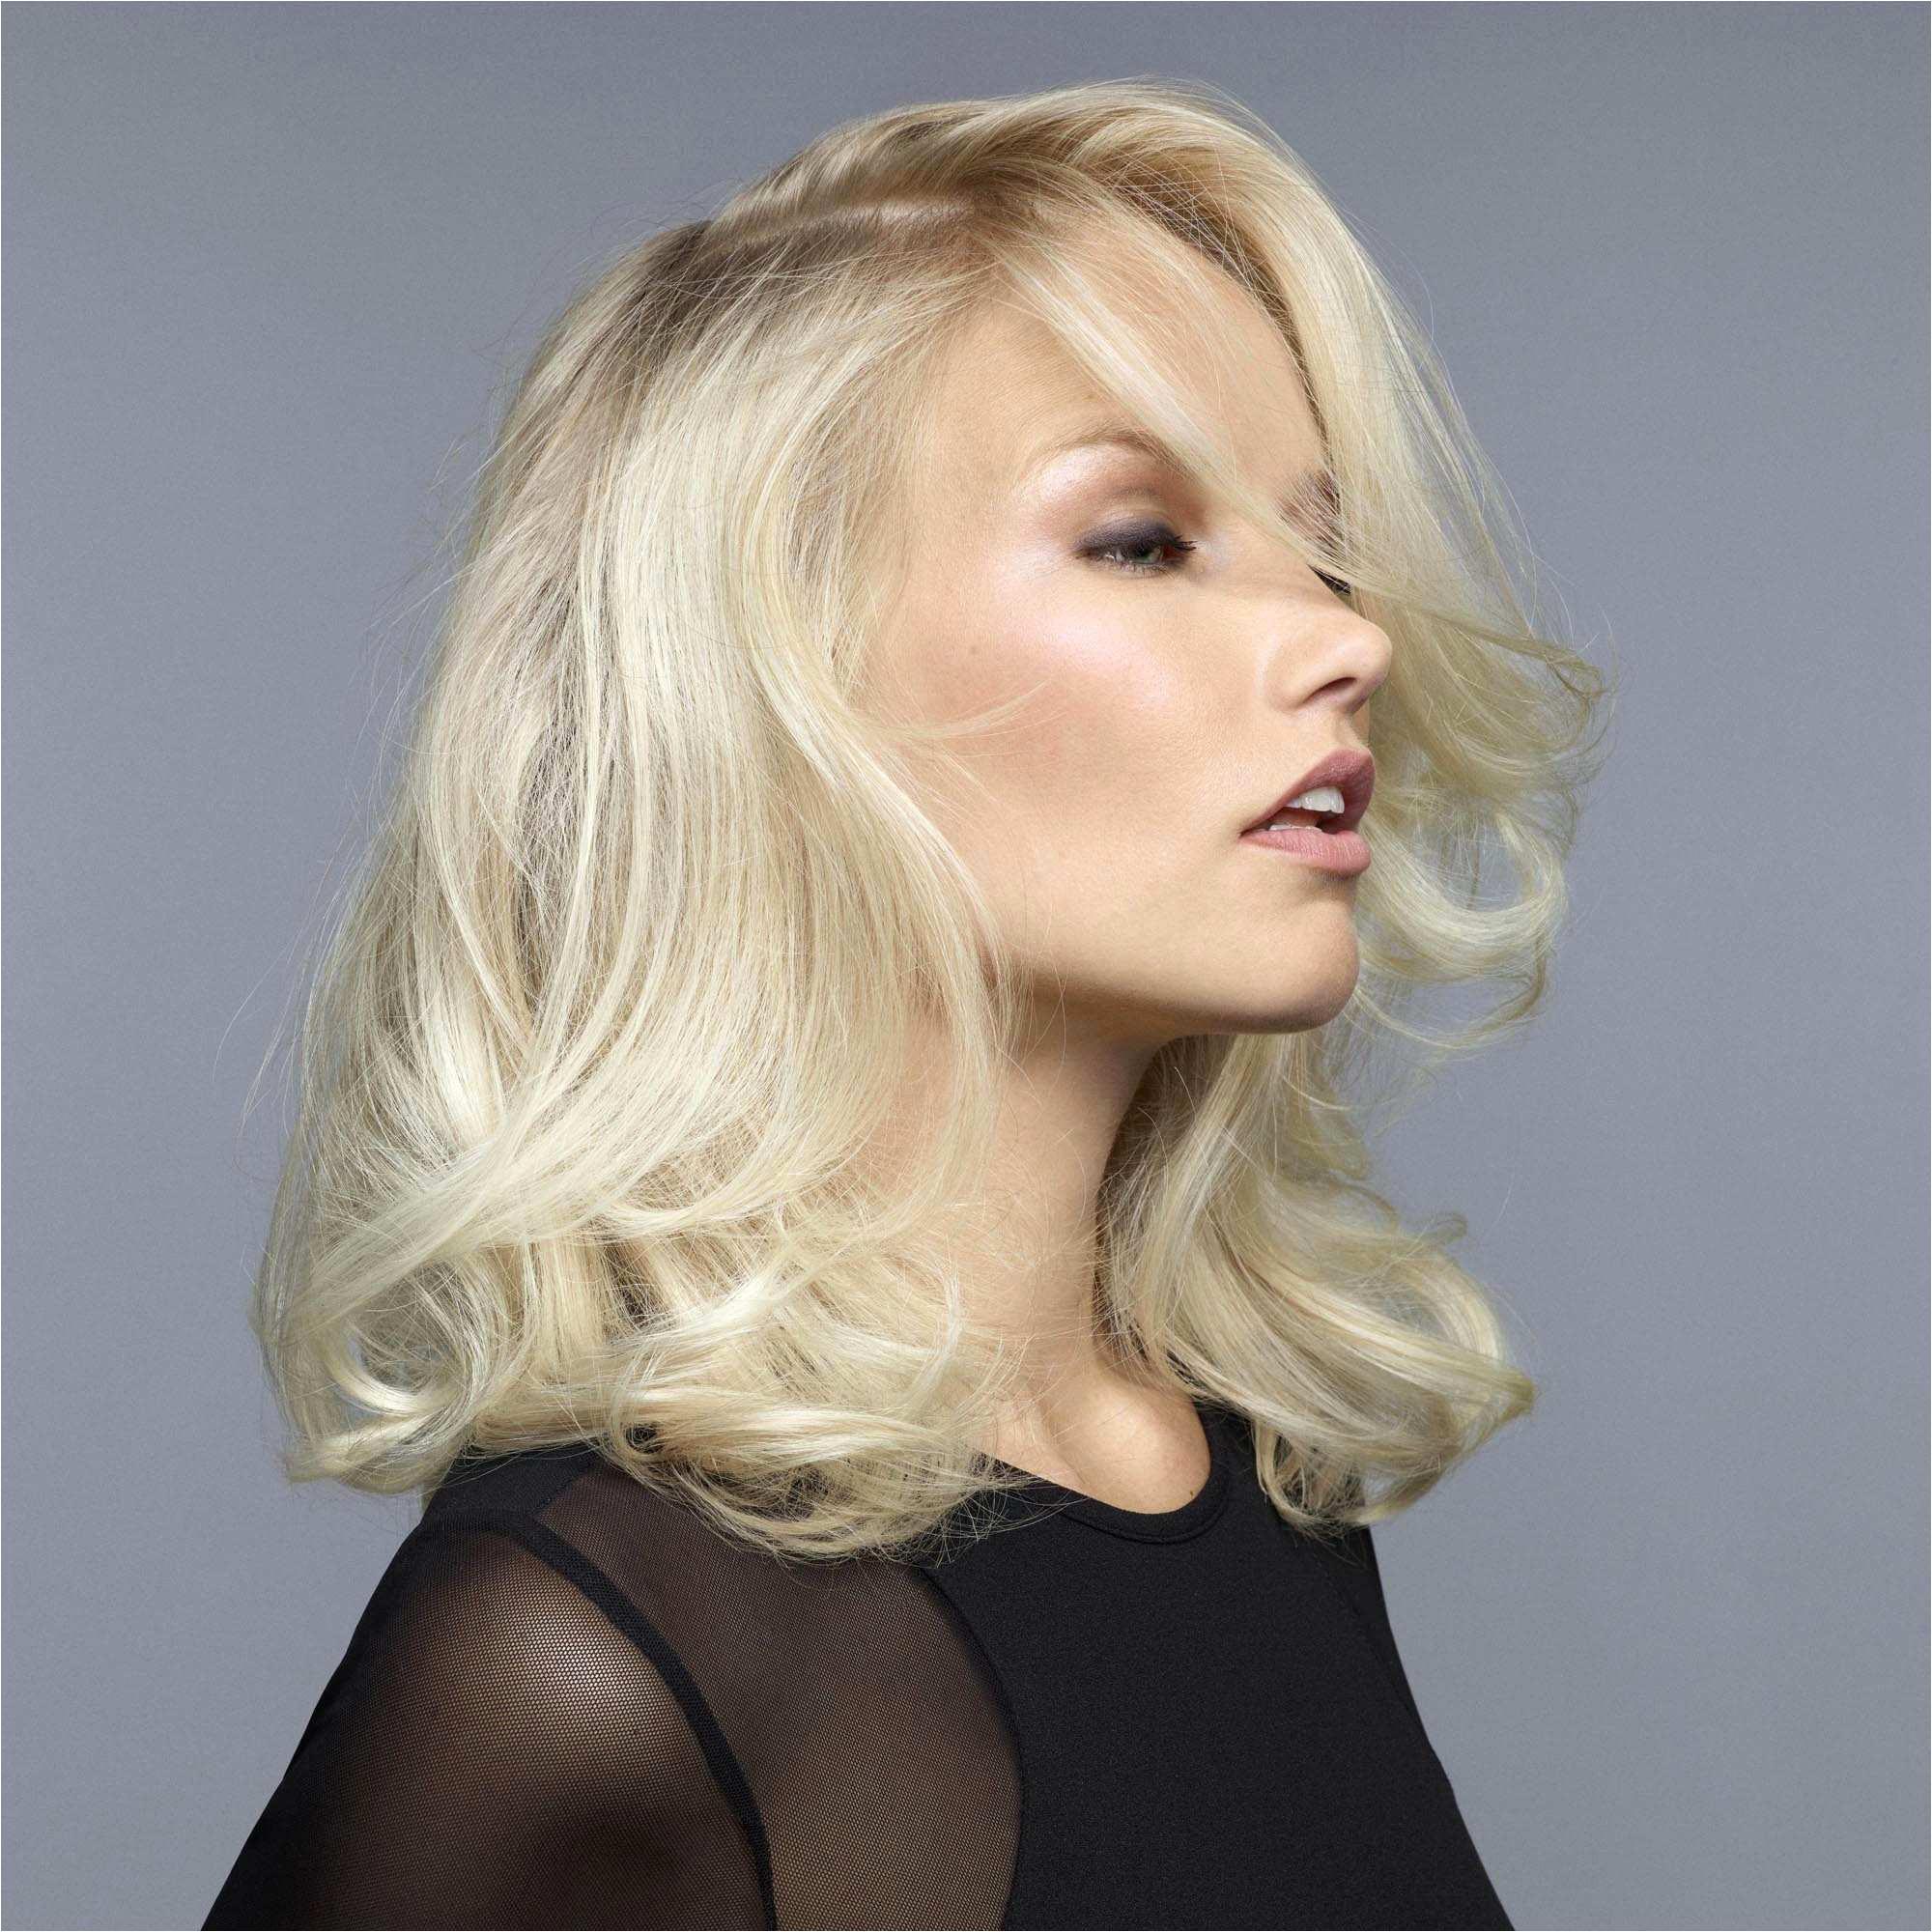 Asian Hair Tips Elegant Long Hair Tips Famous Hair Tips and Girl Haircut 0d Asian